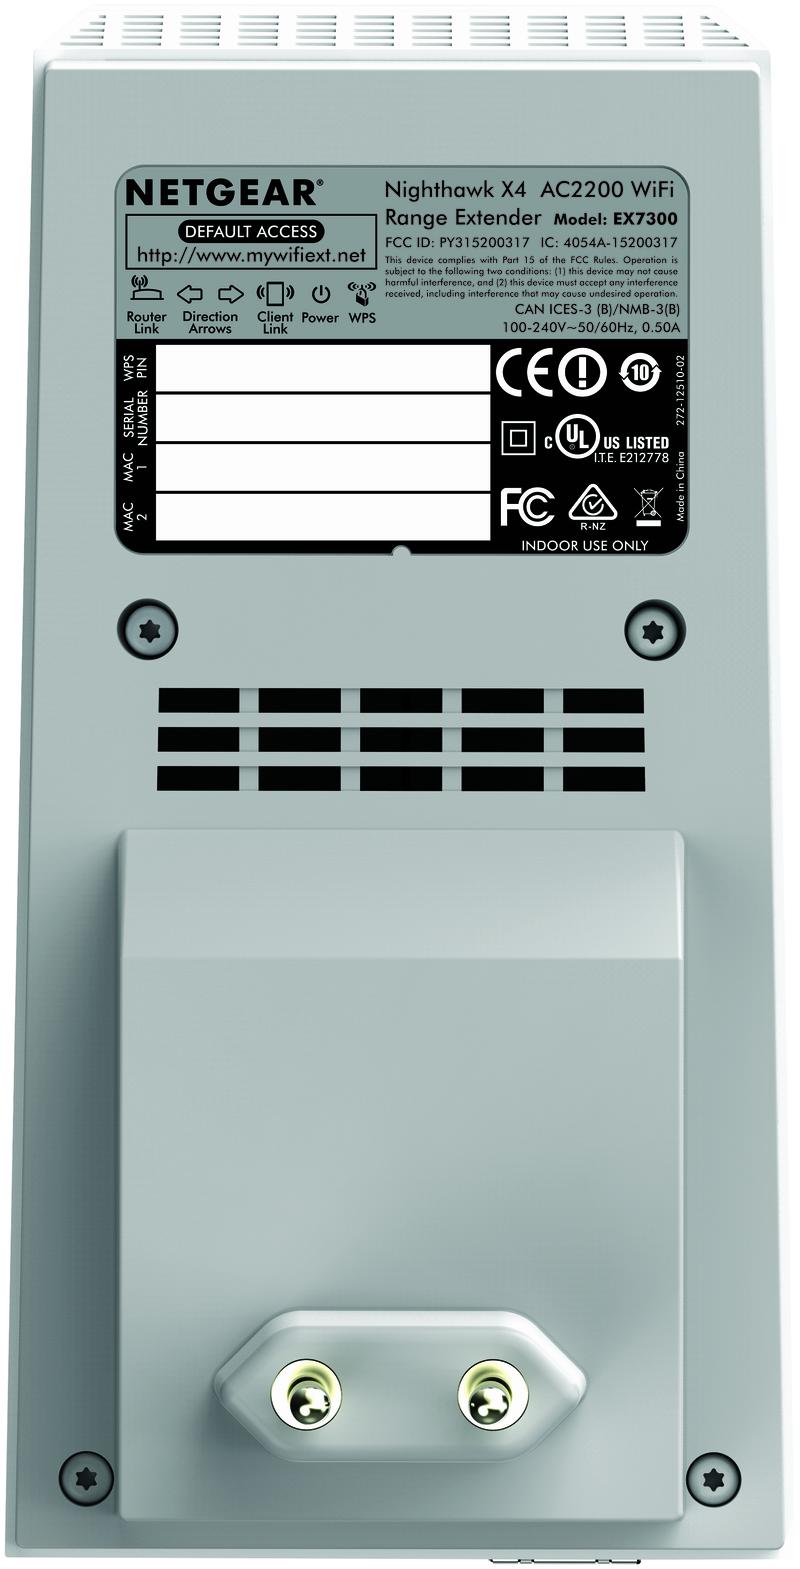 Netgear EX7300 AC2200 Nighthawk X4 WiFi Mesh Extender